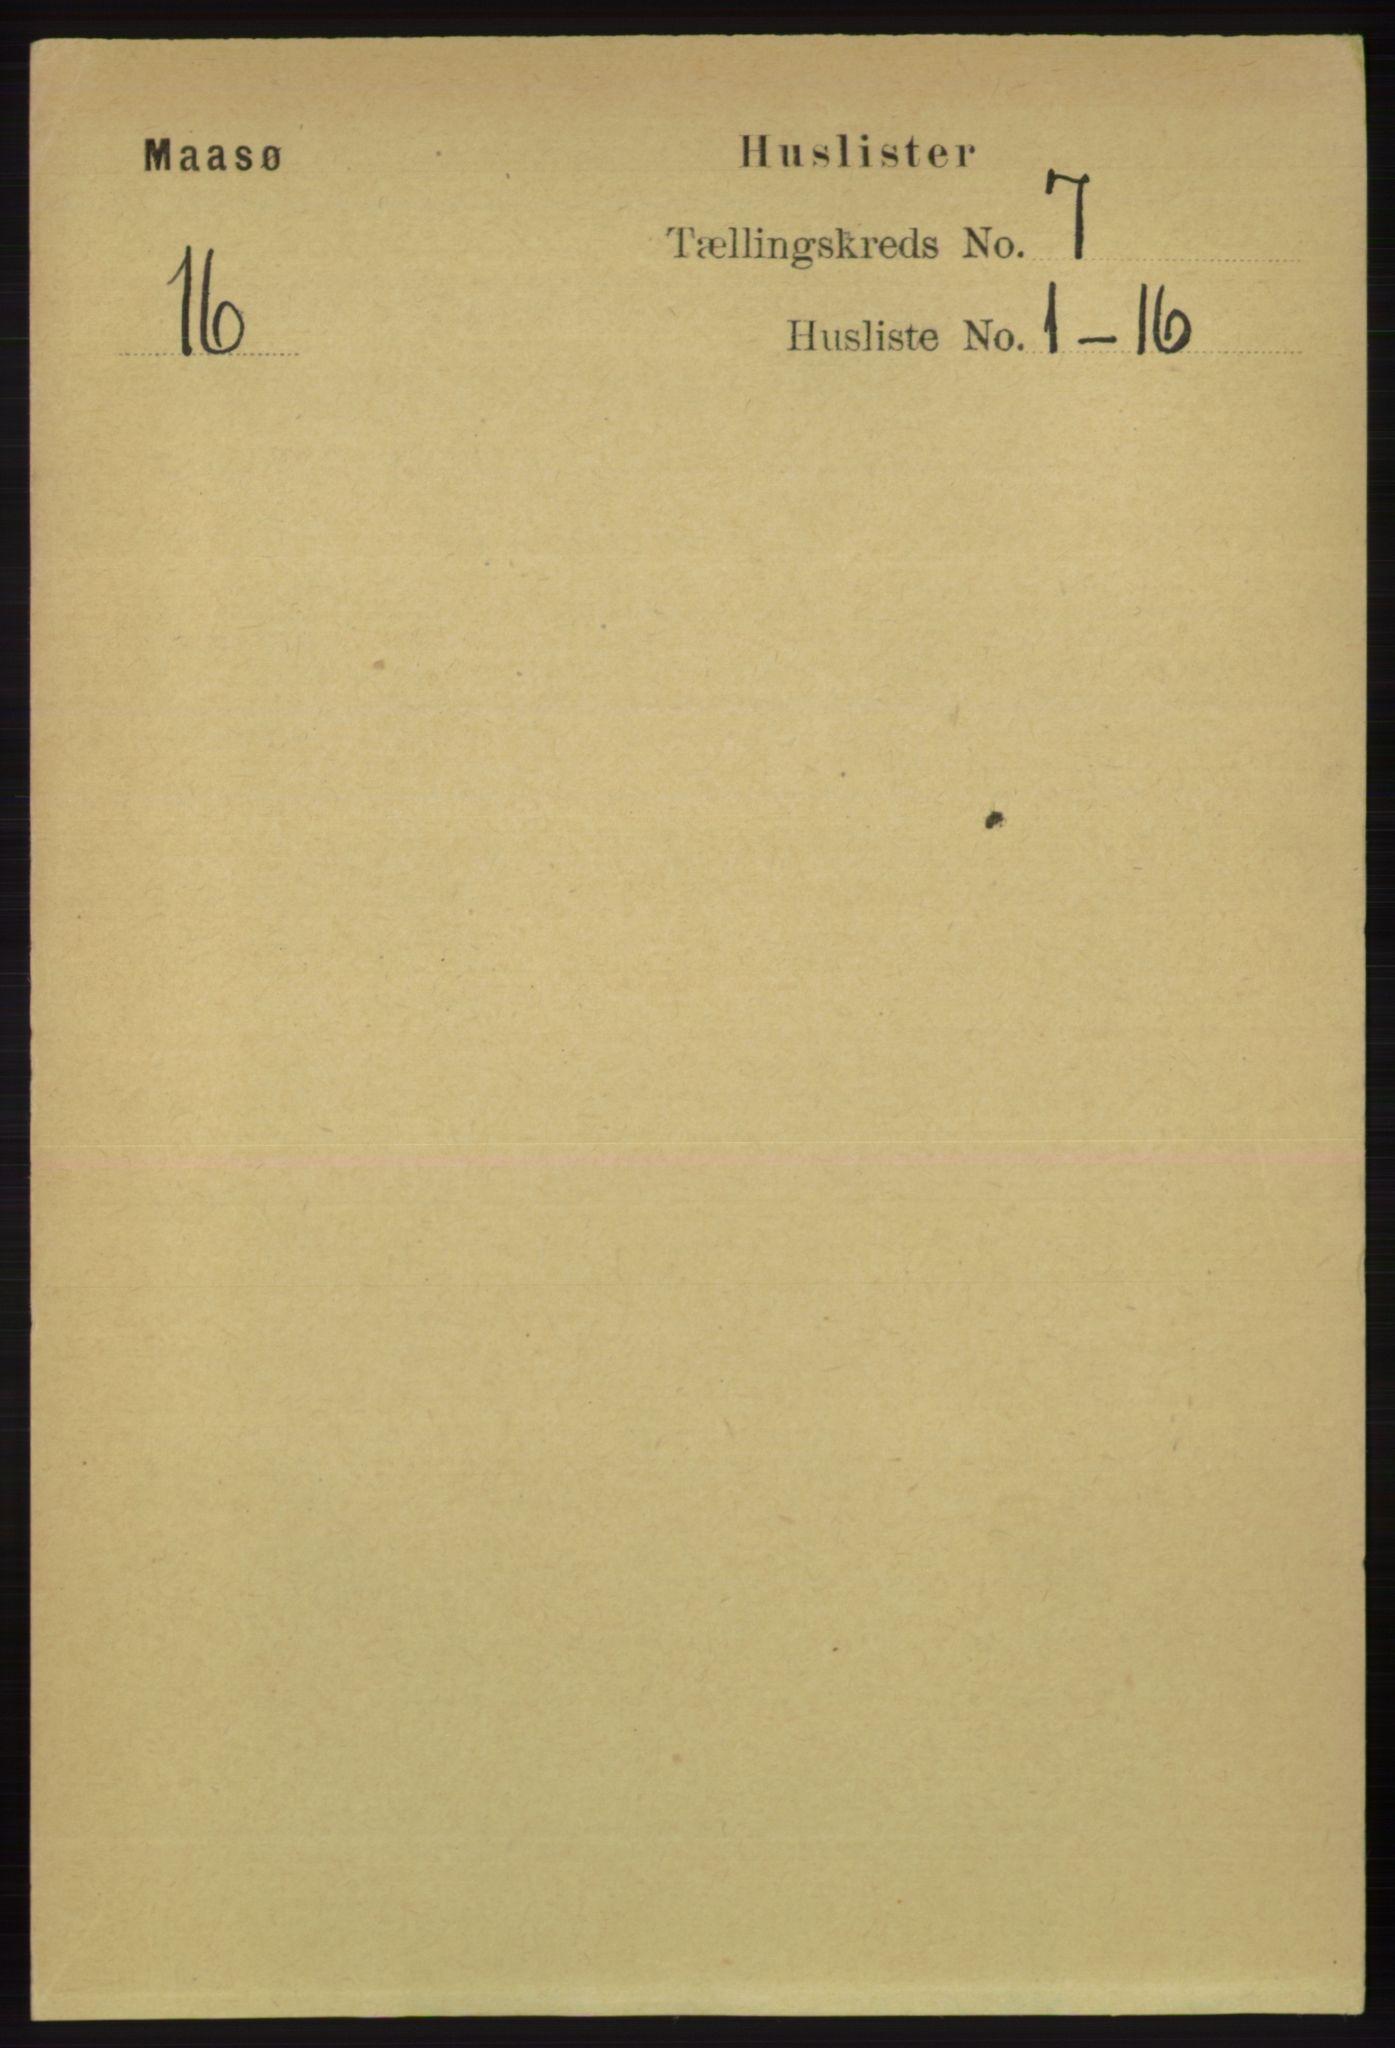 RA, Folketelling 1891 for 2018 Måsøy herred, 1891, s. 1384